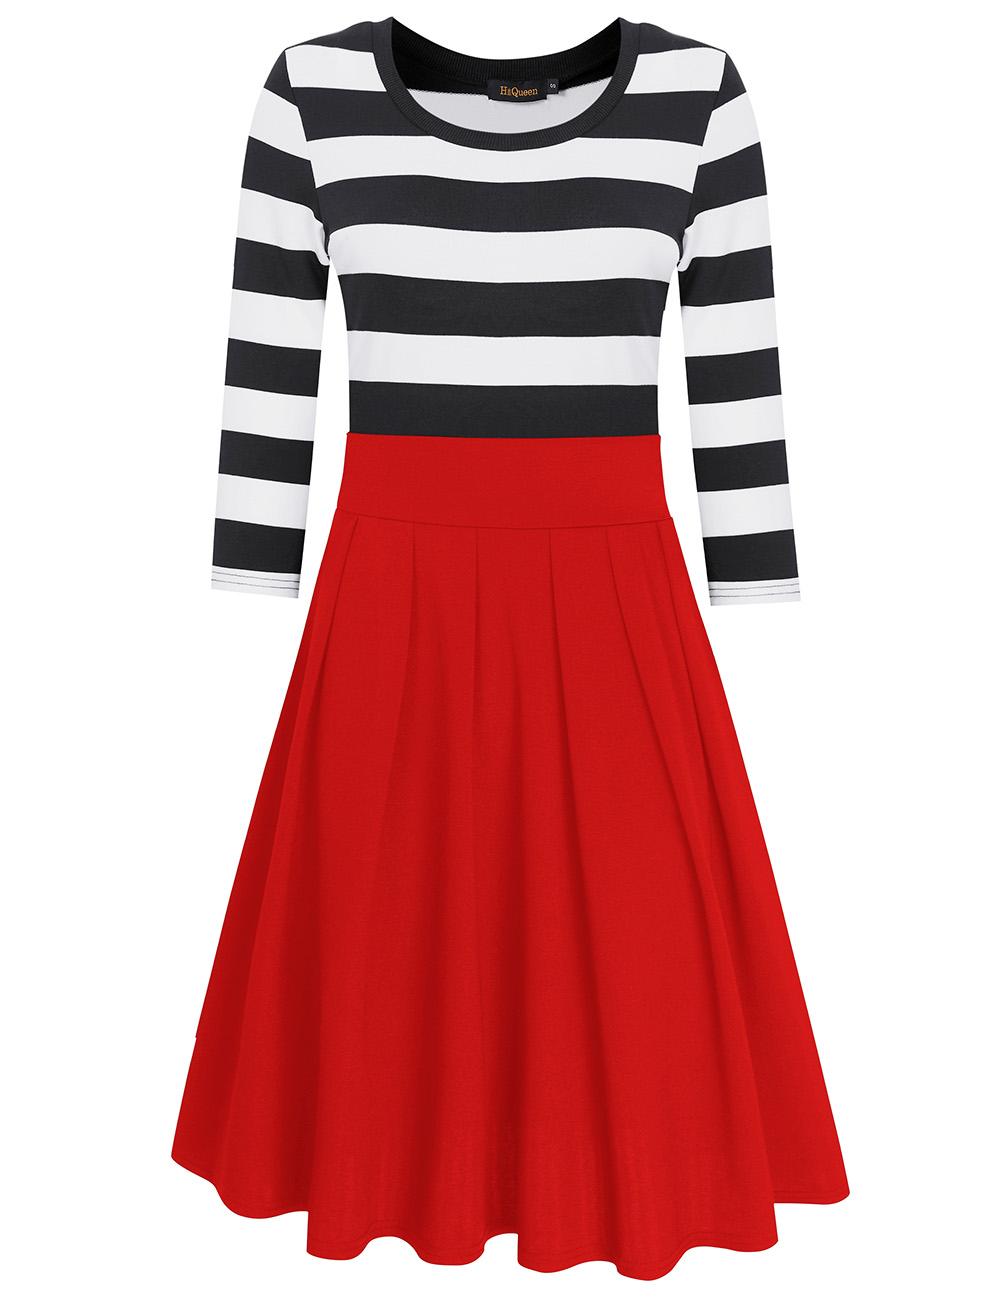 HiQueen Women Casual Scoop Neck 3/4 Sleeve A-Line Swing Dress Stripe Modest Dresses Red_L